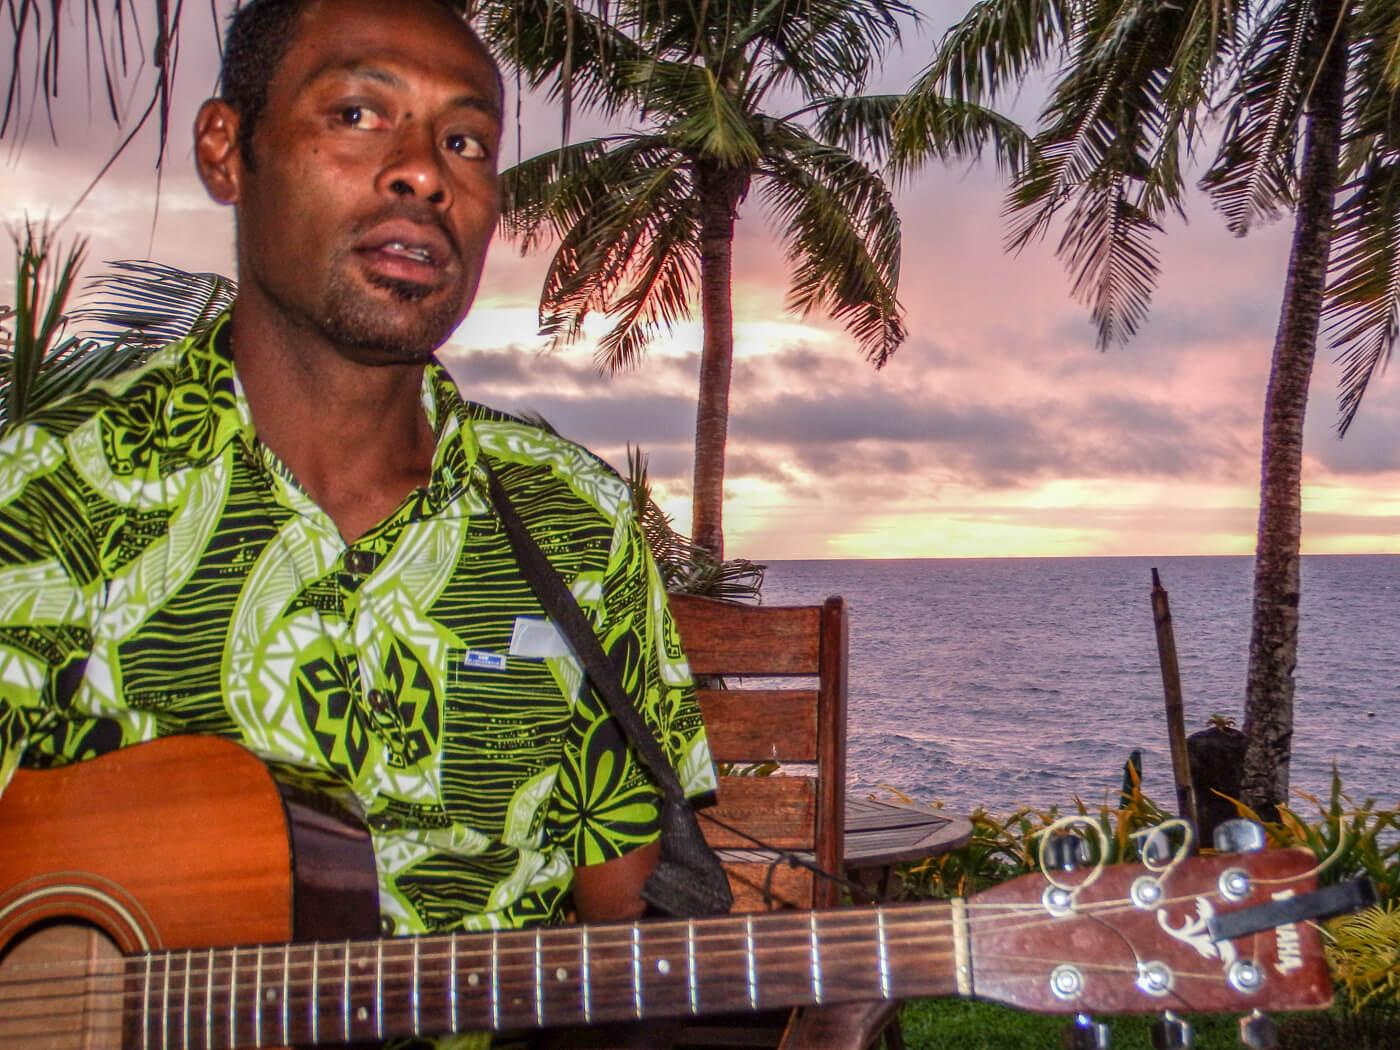 Soni plays guitar as the sun sets at Paradise Taveuni. © Roger Harris